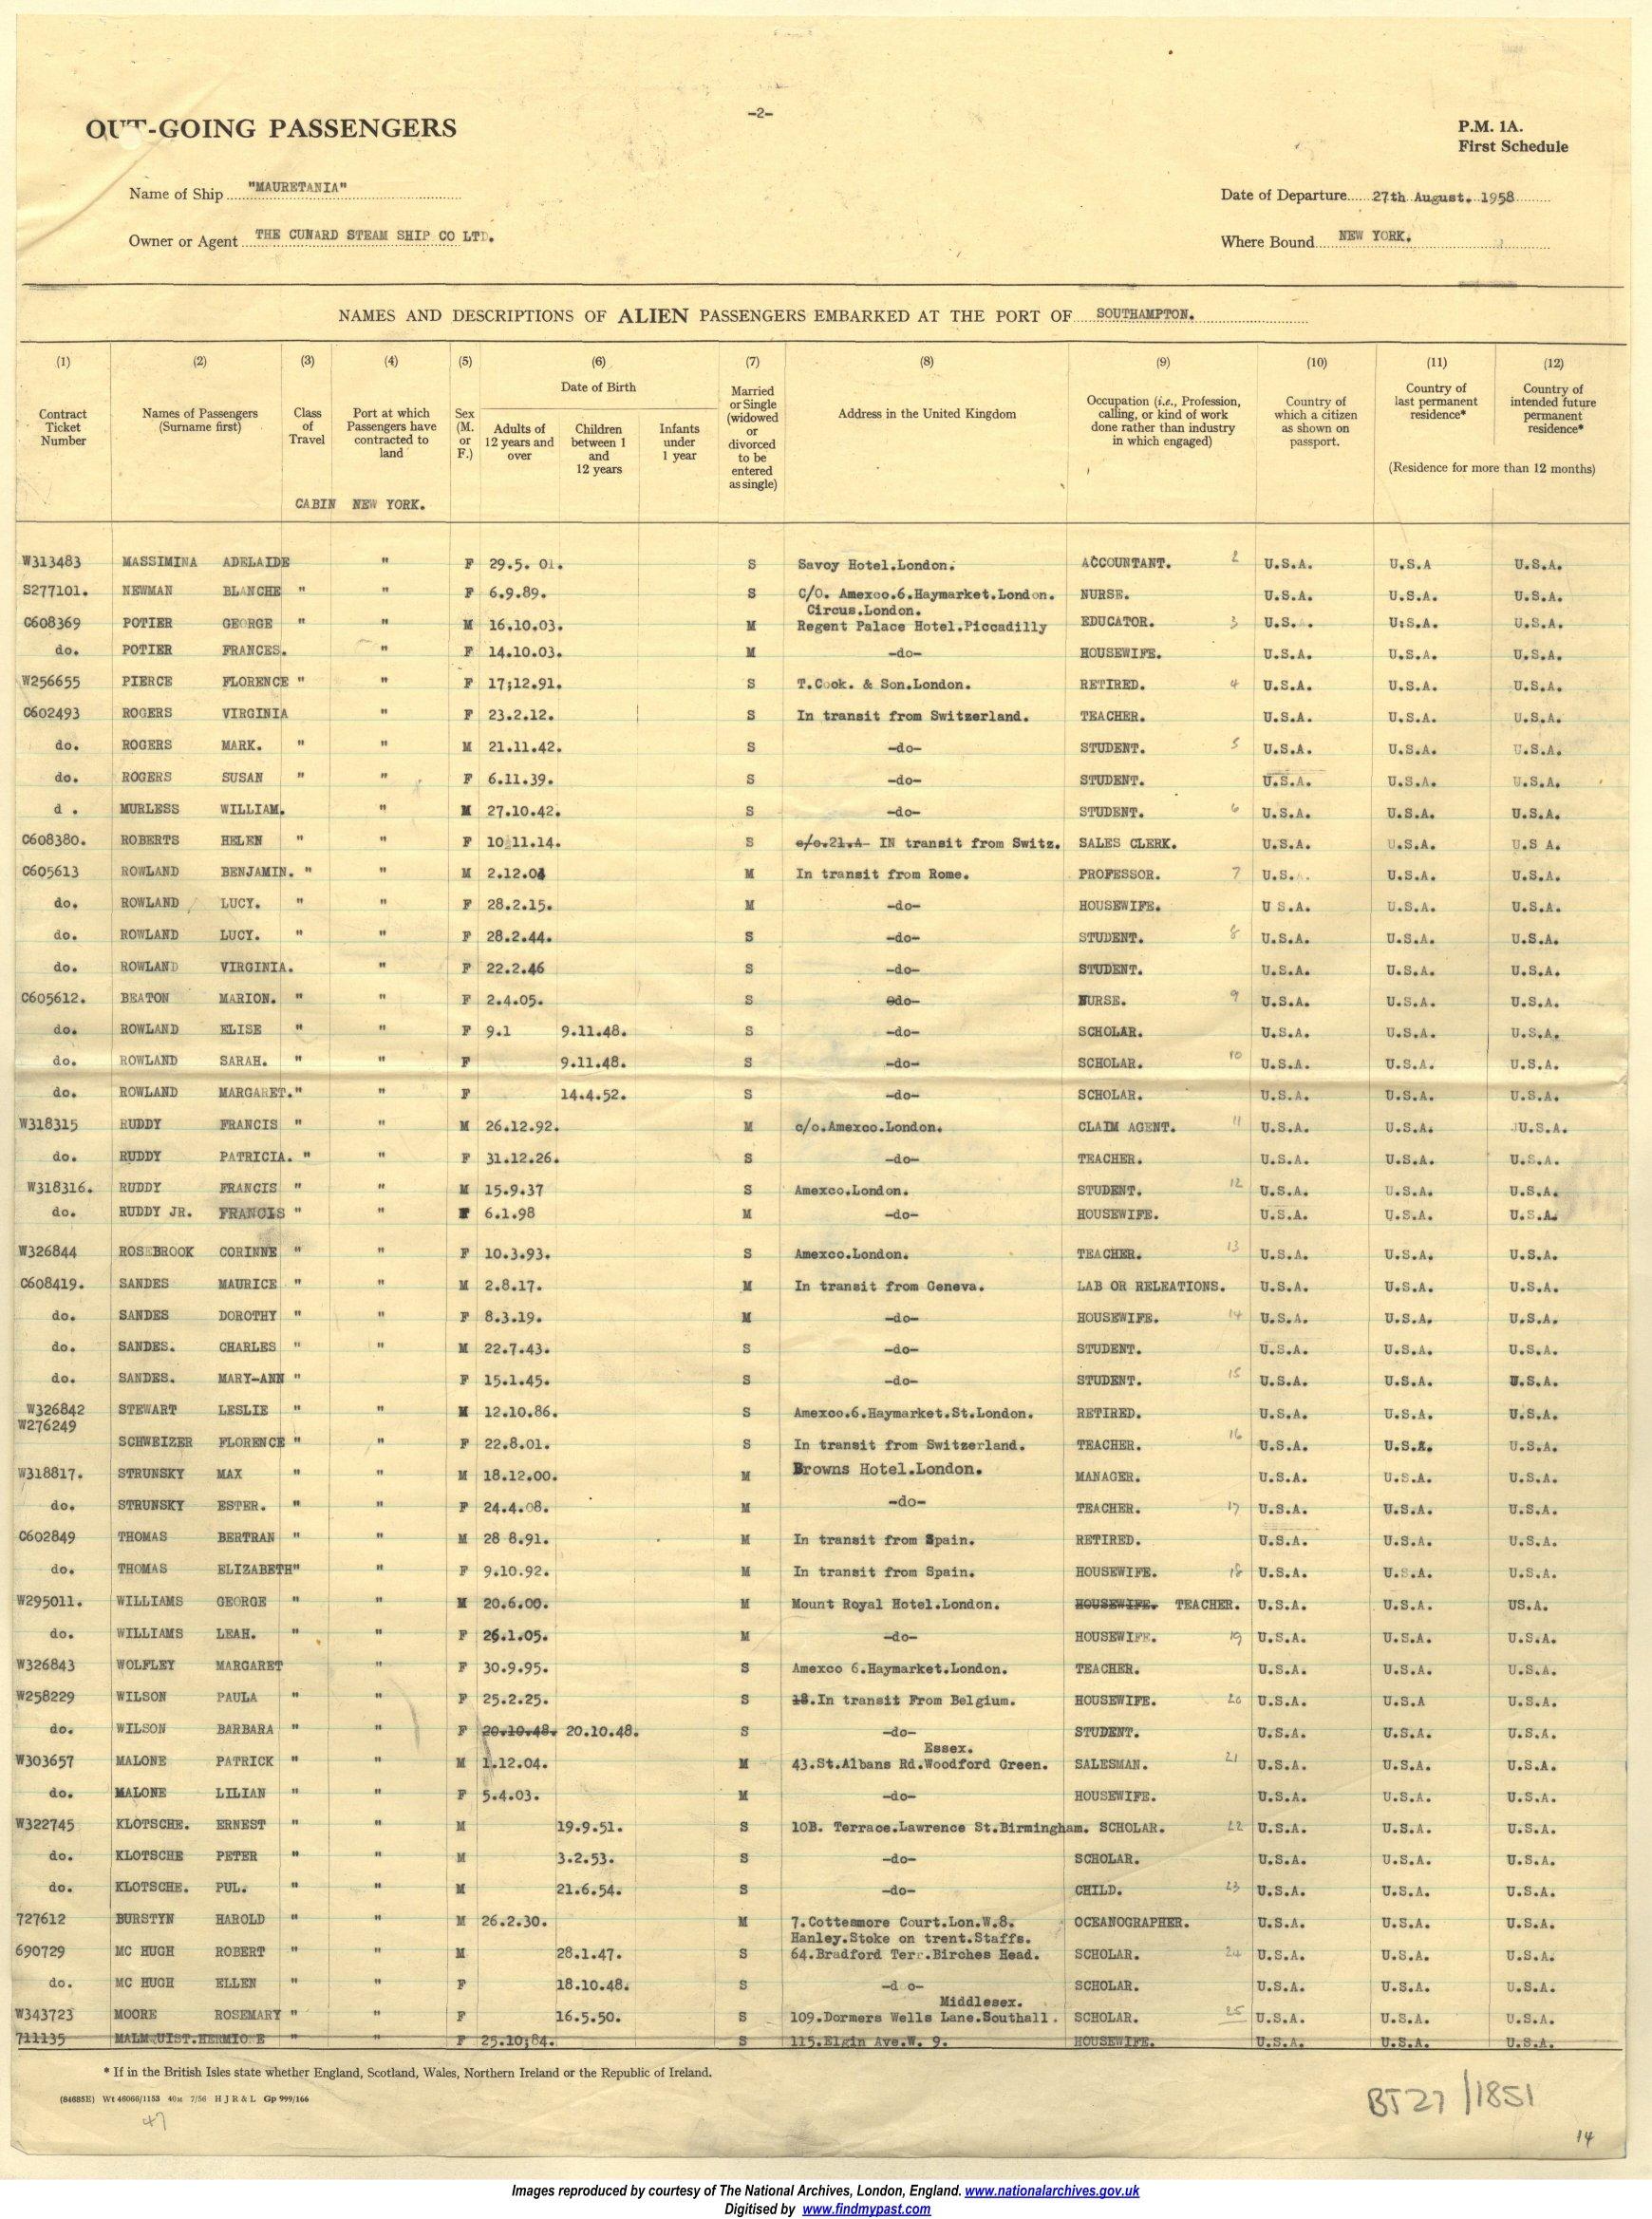 Passenger list Southampton to New York 1958